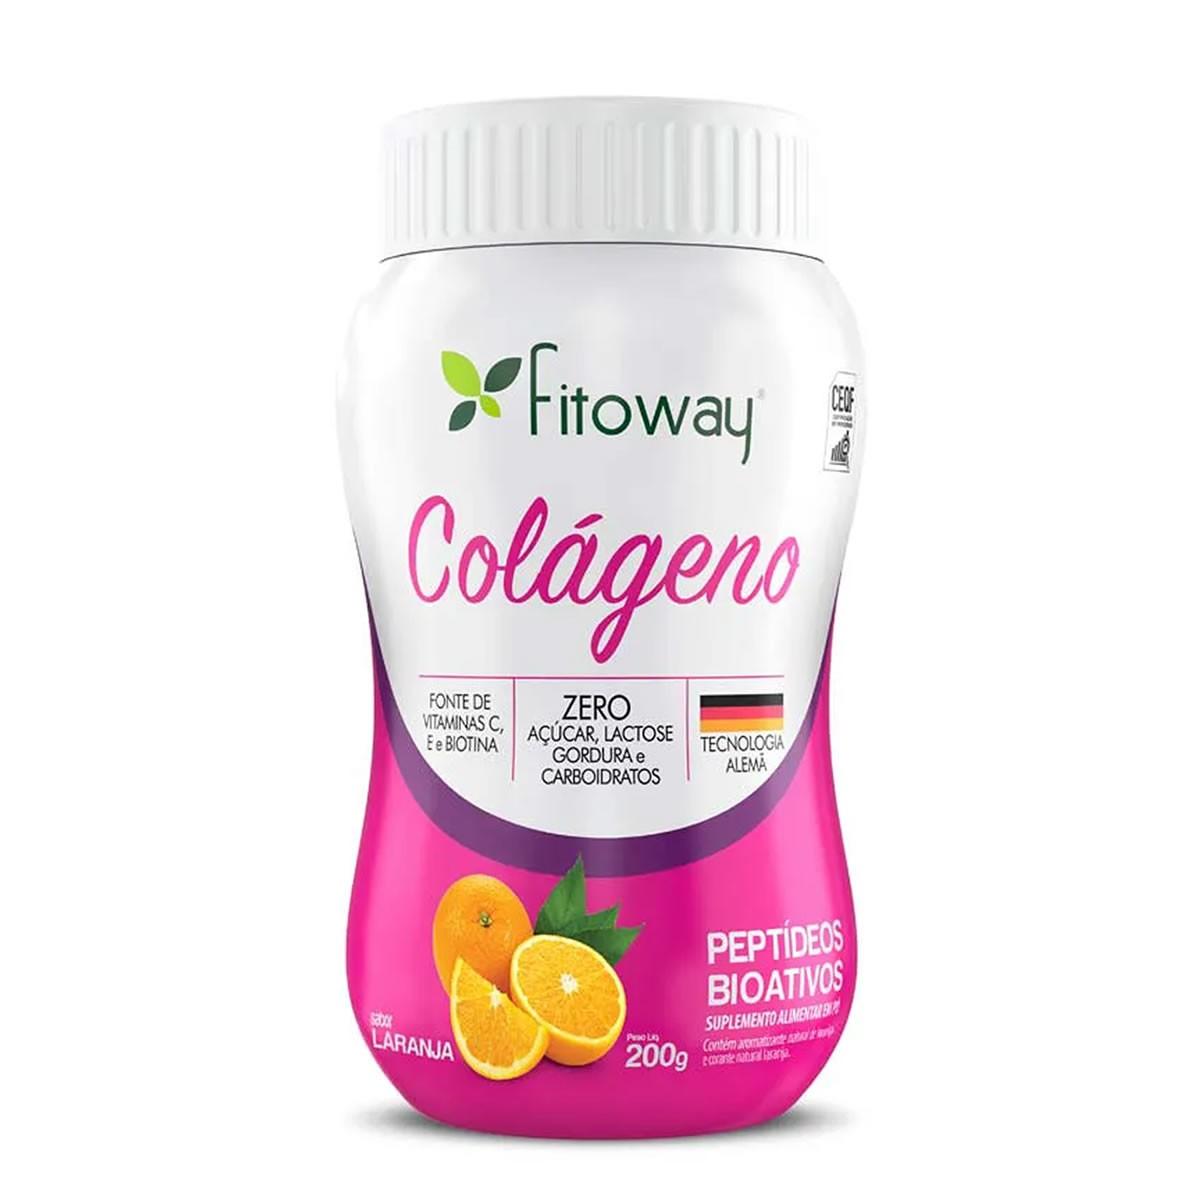 Colágeno 200g - Fitoway